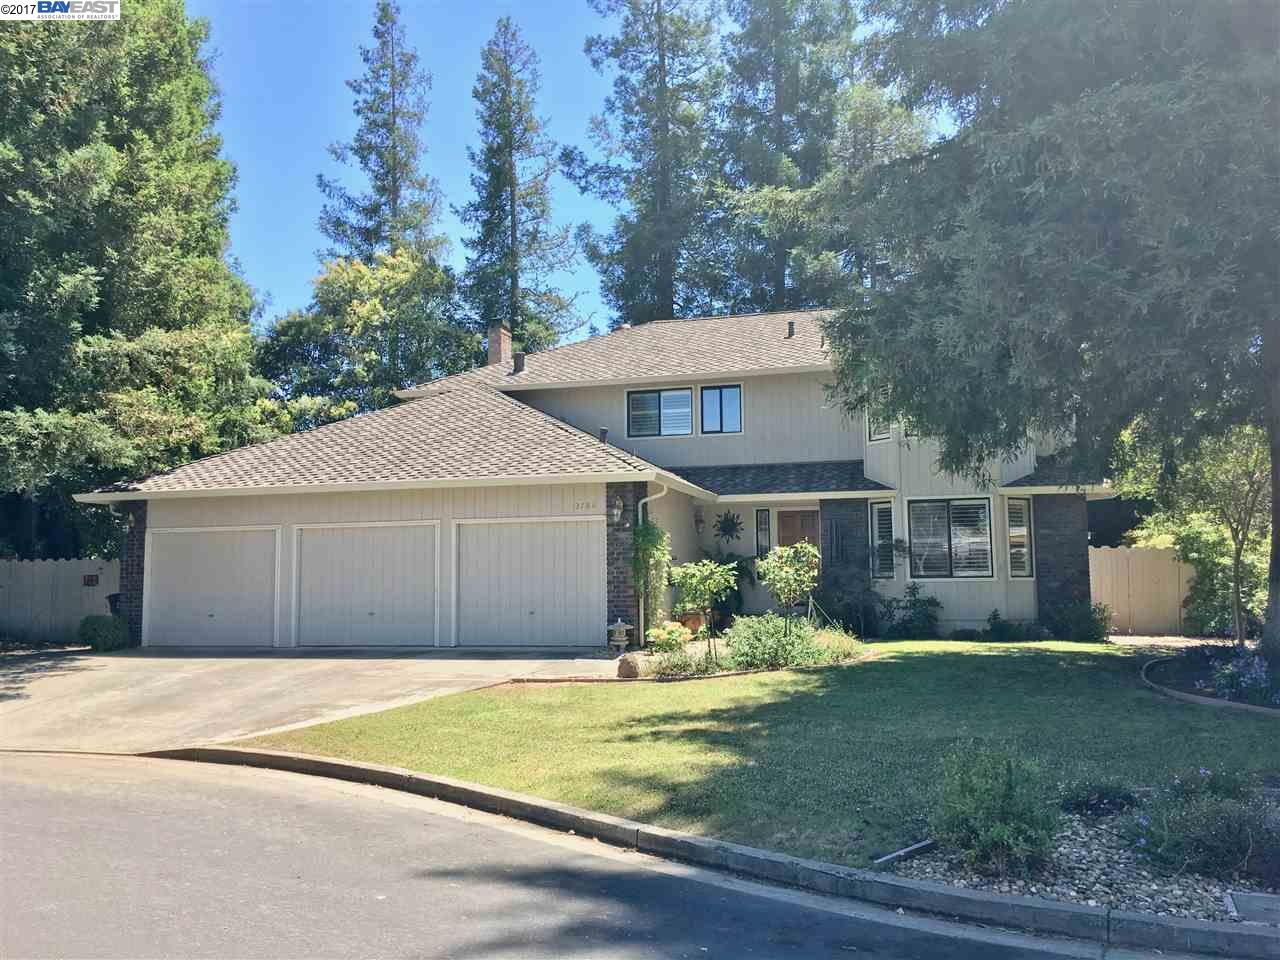 3786 Via Del Lisa Ct, CONCORD, CA 94518